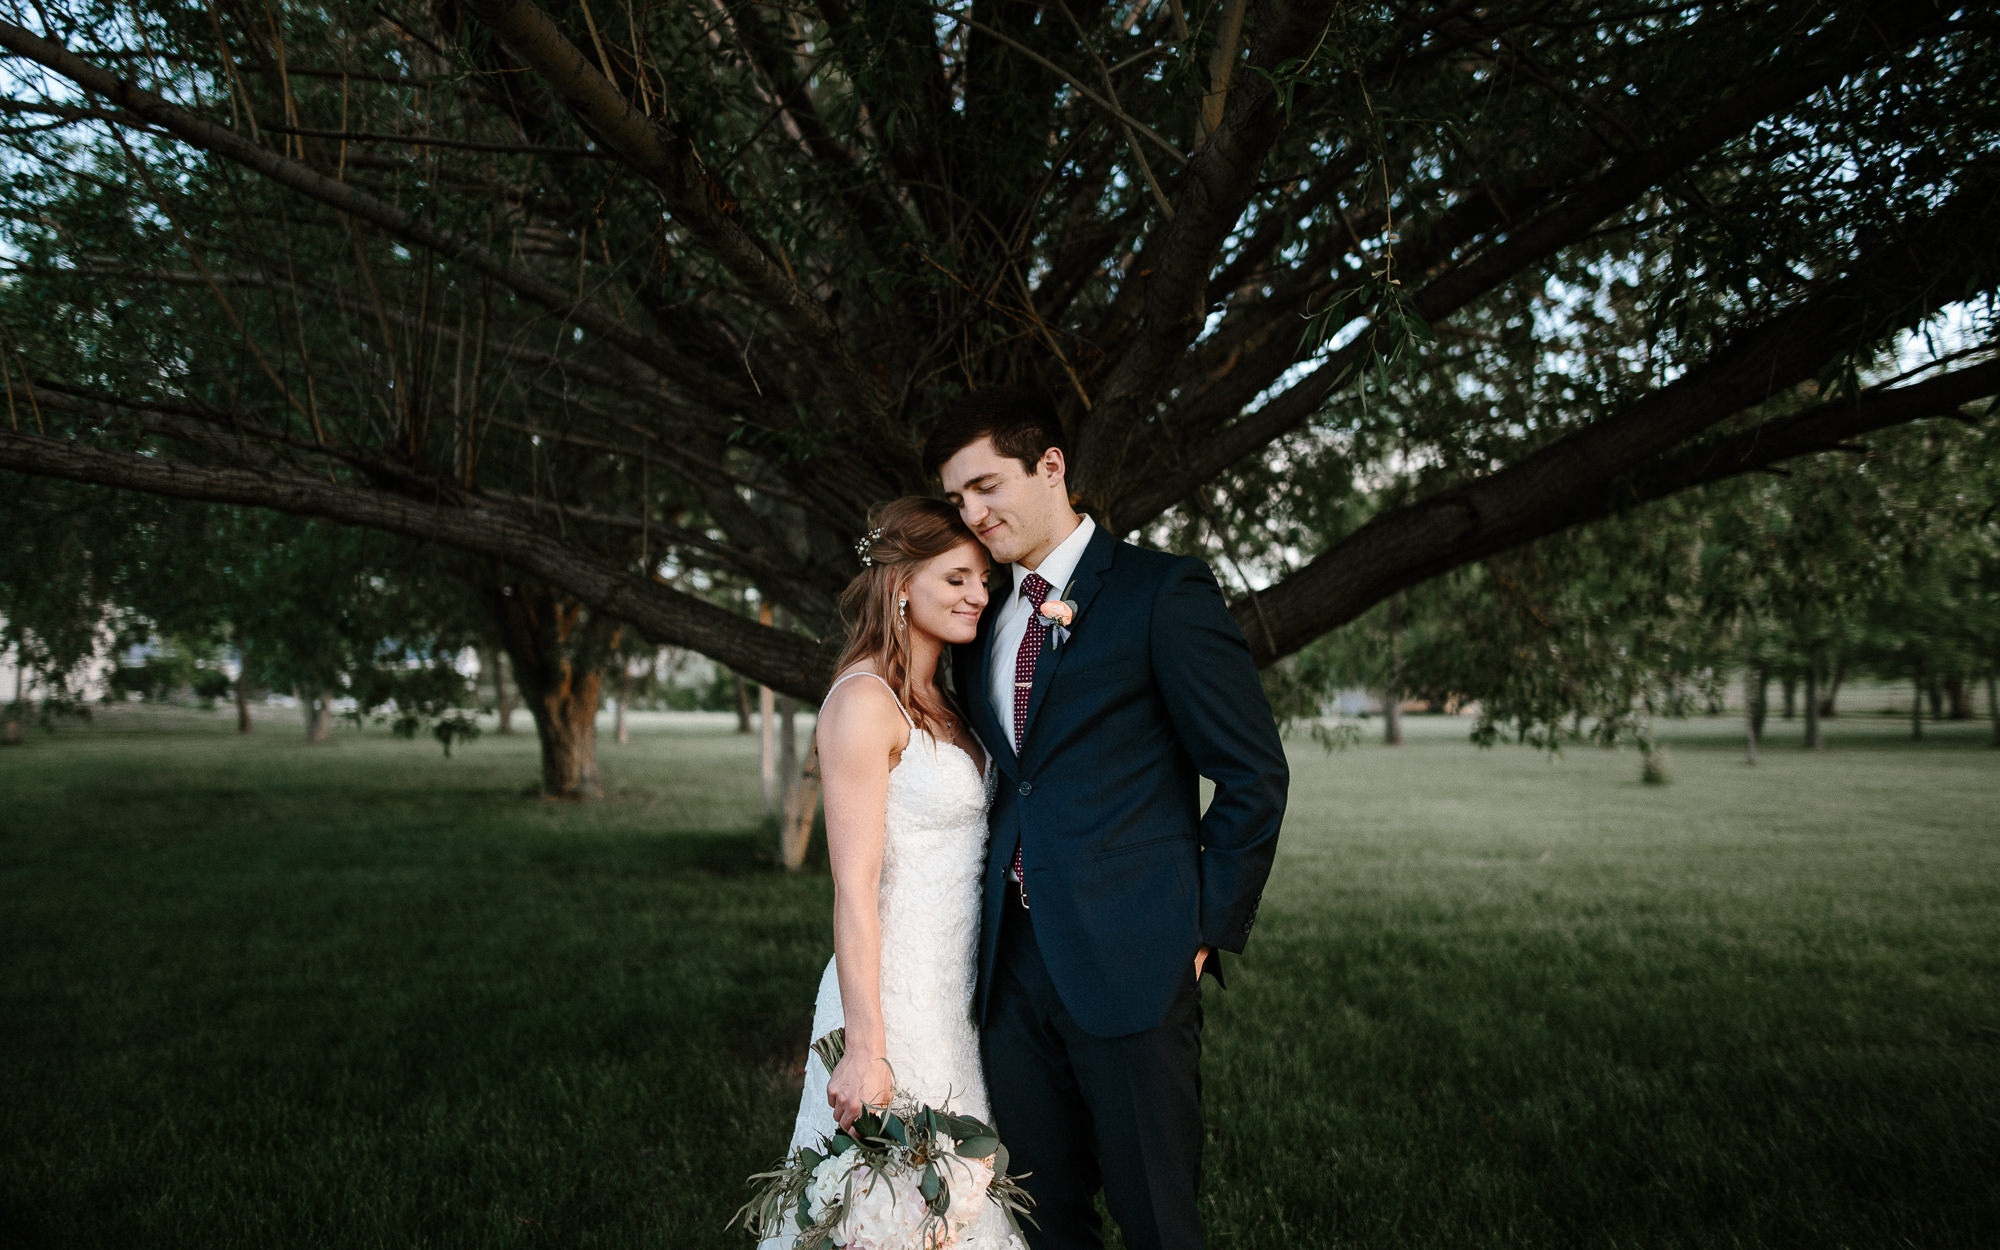 wedding-elopement-adventerous-romantic-timeless-south-dakota-blue-haven-barn-085.jpg